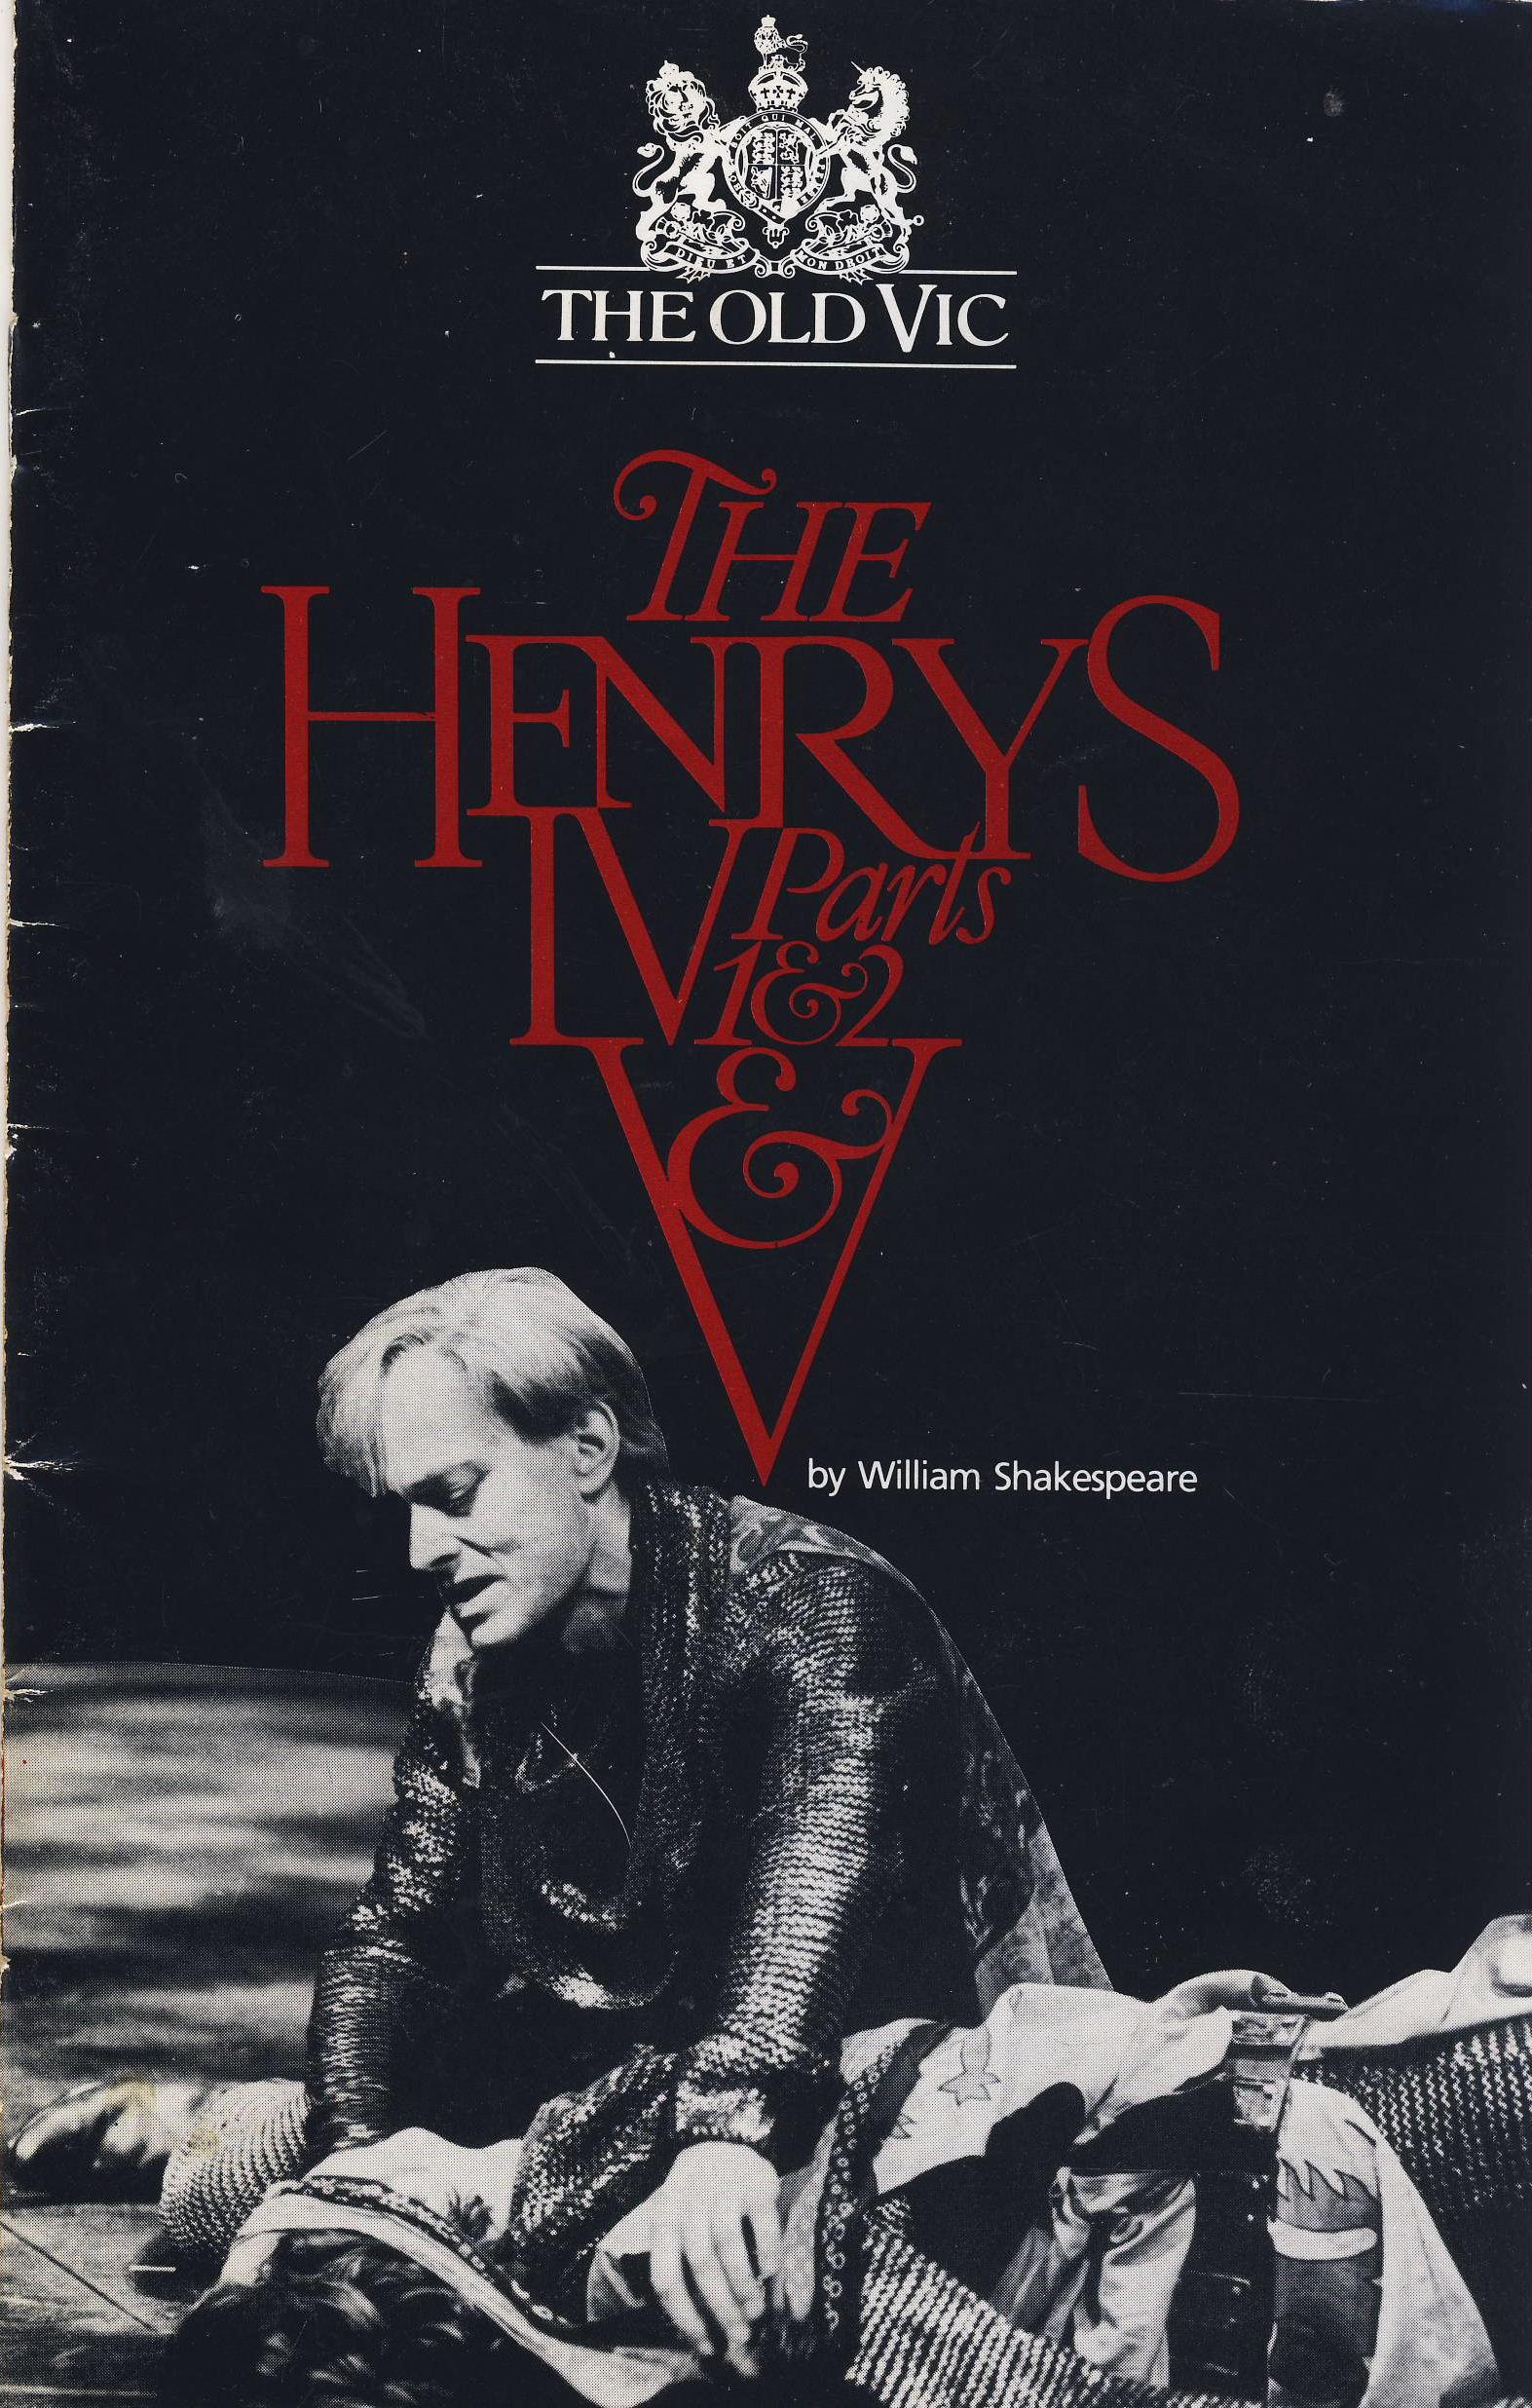 1987 The Henrys PATRICK O'CONNELL Vintage OLD VIC Theatre Programme cast list also includes Michael Pennington